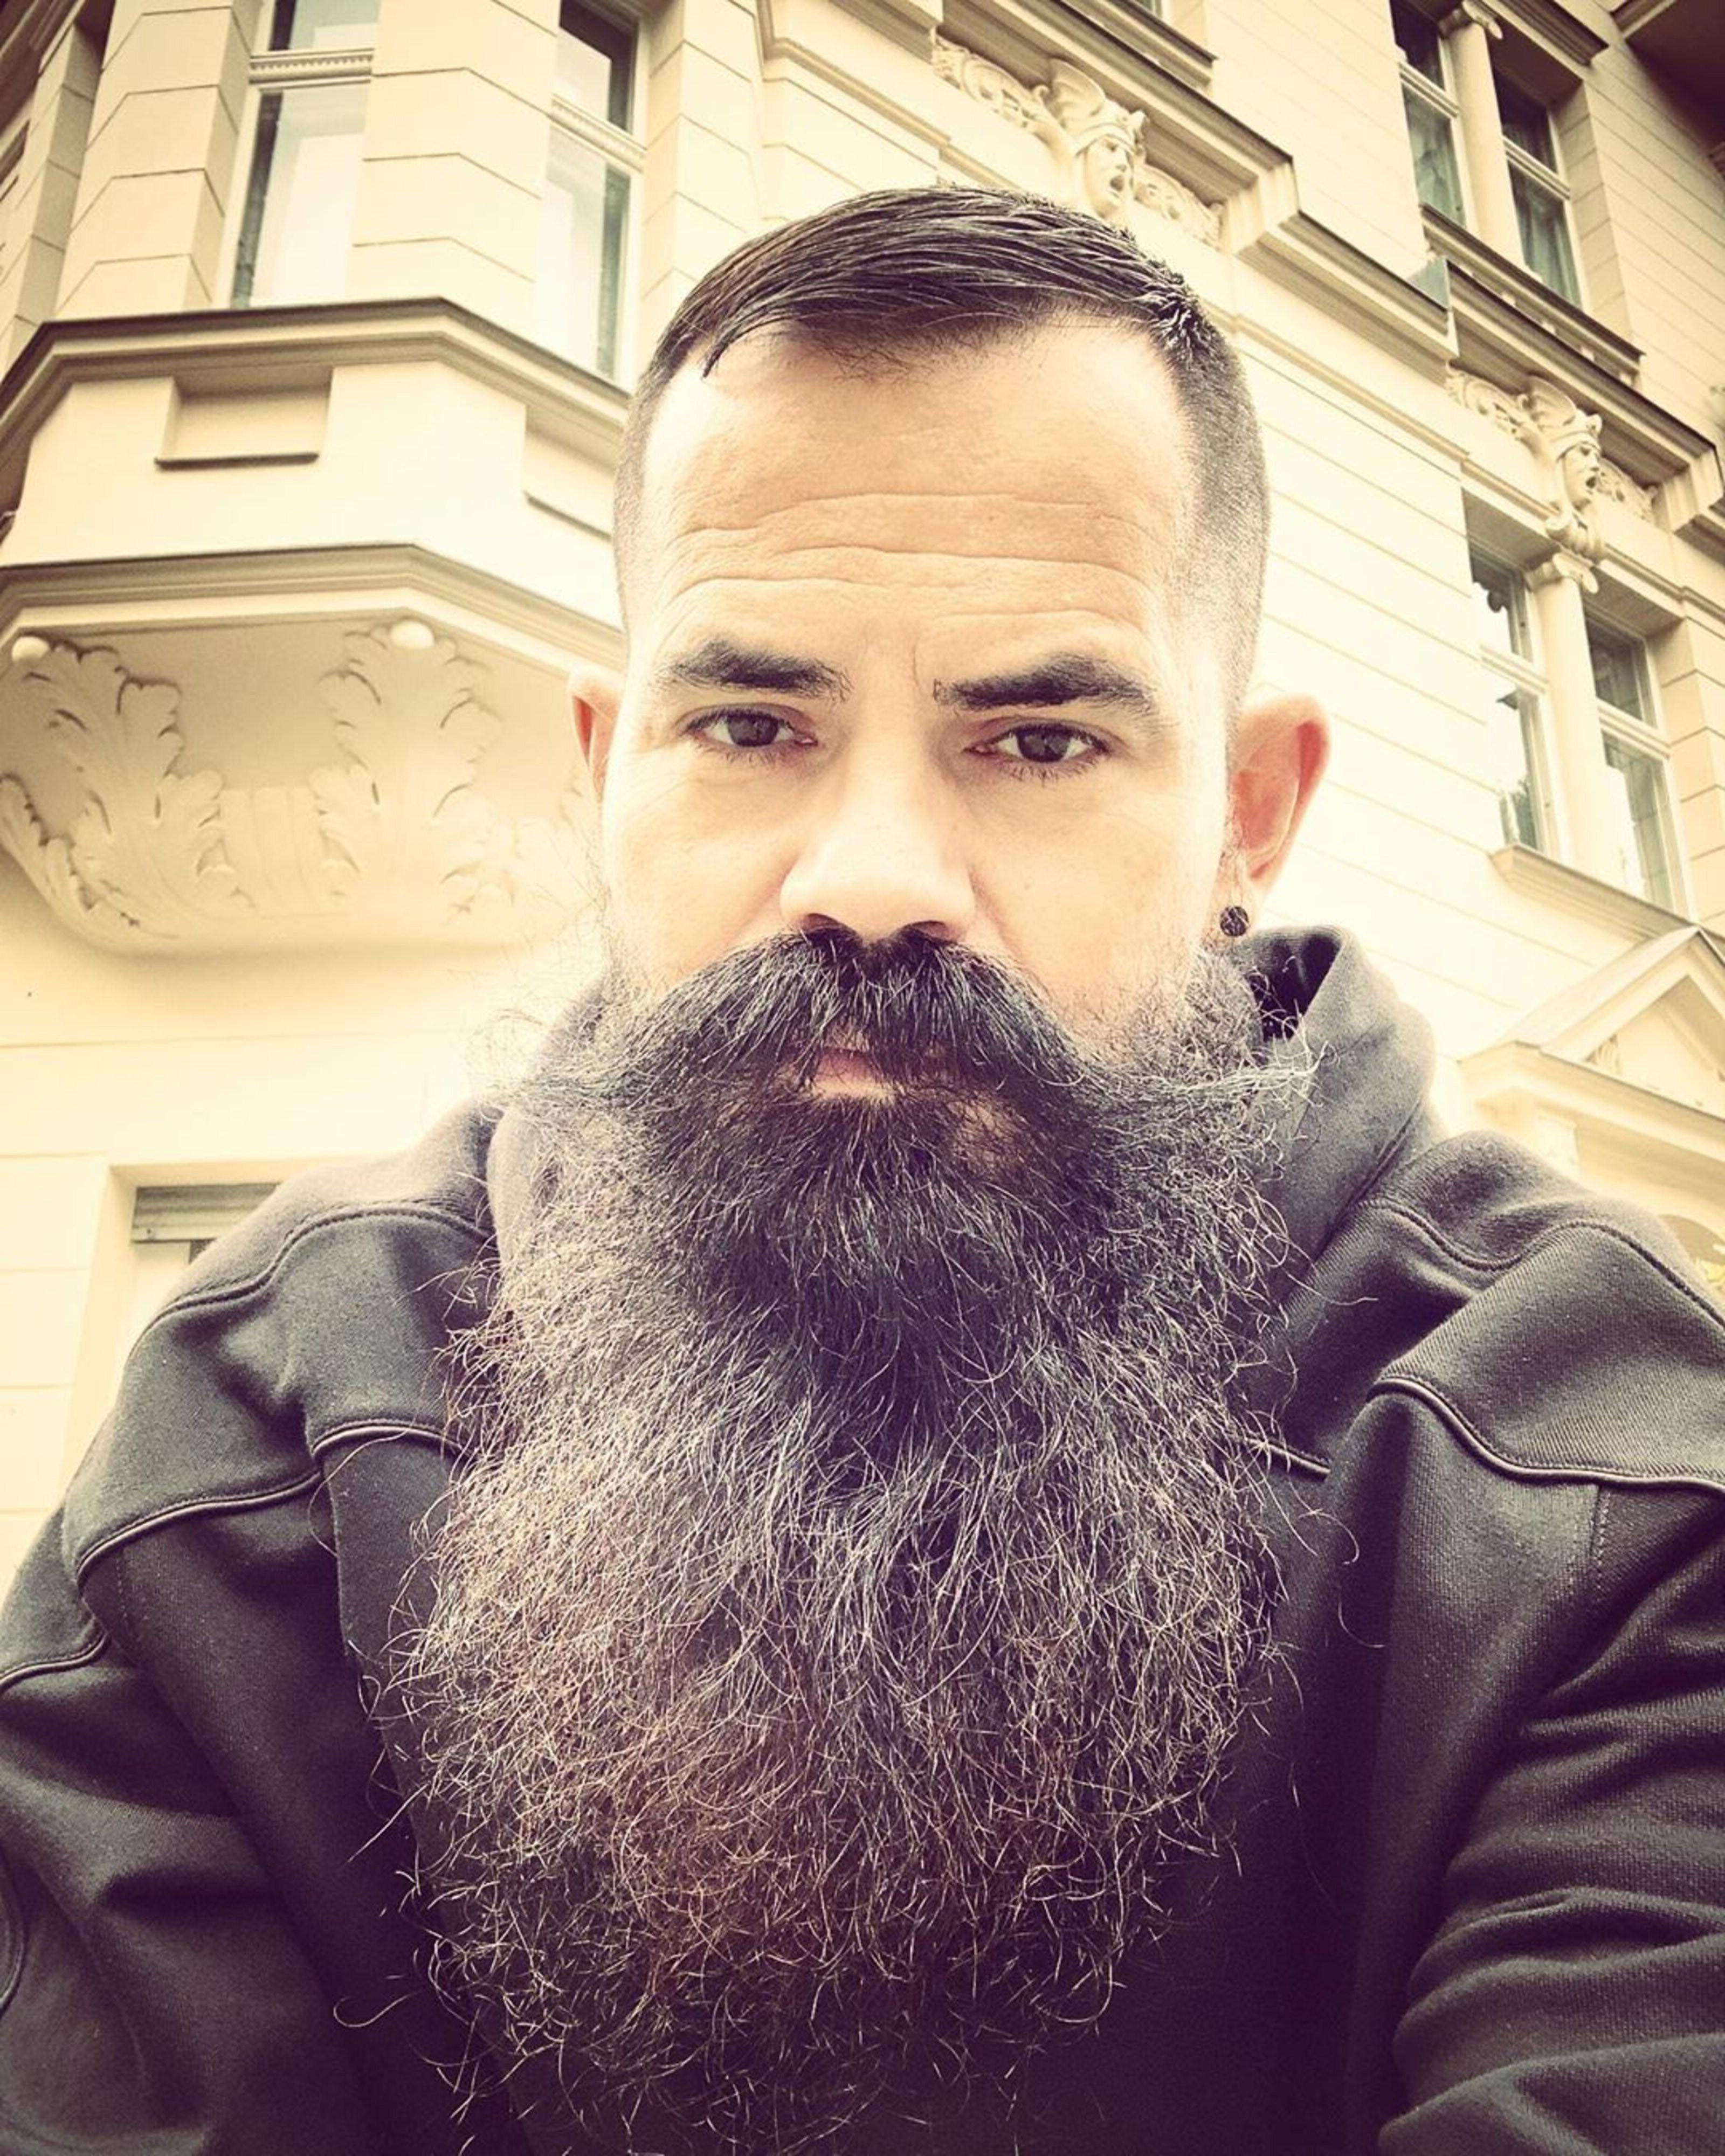 A long beard for Asian men.